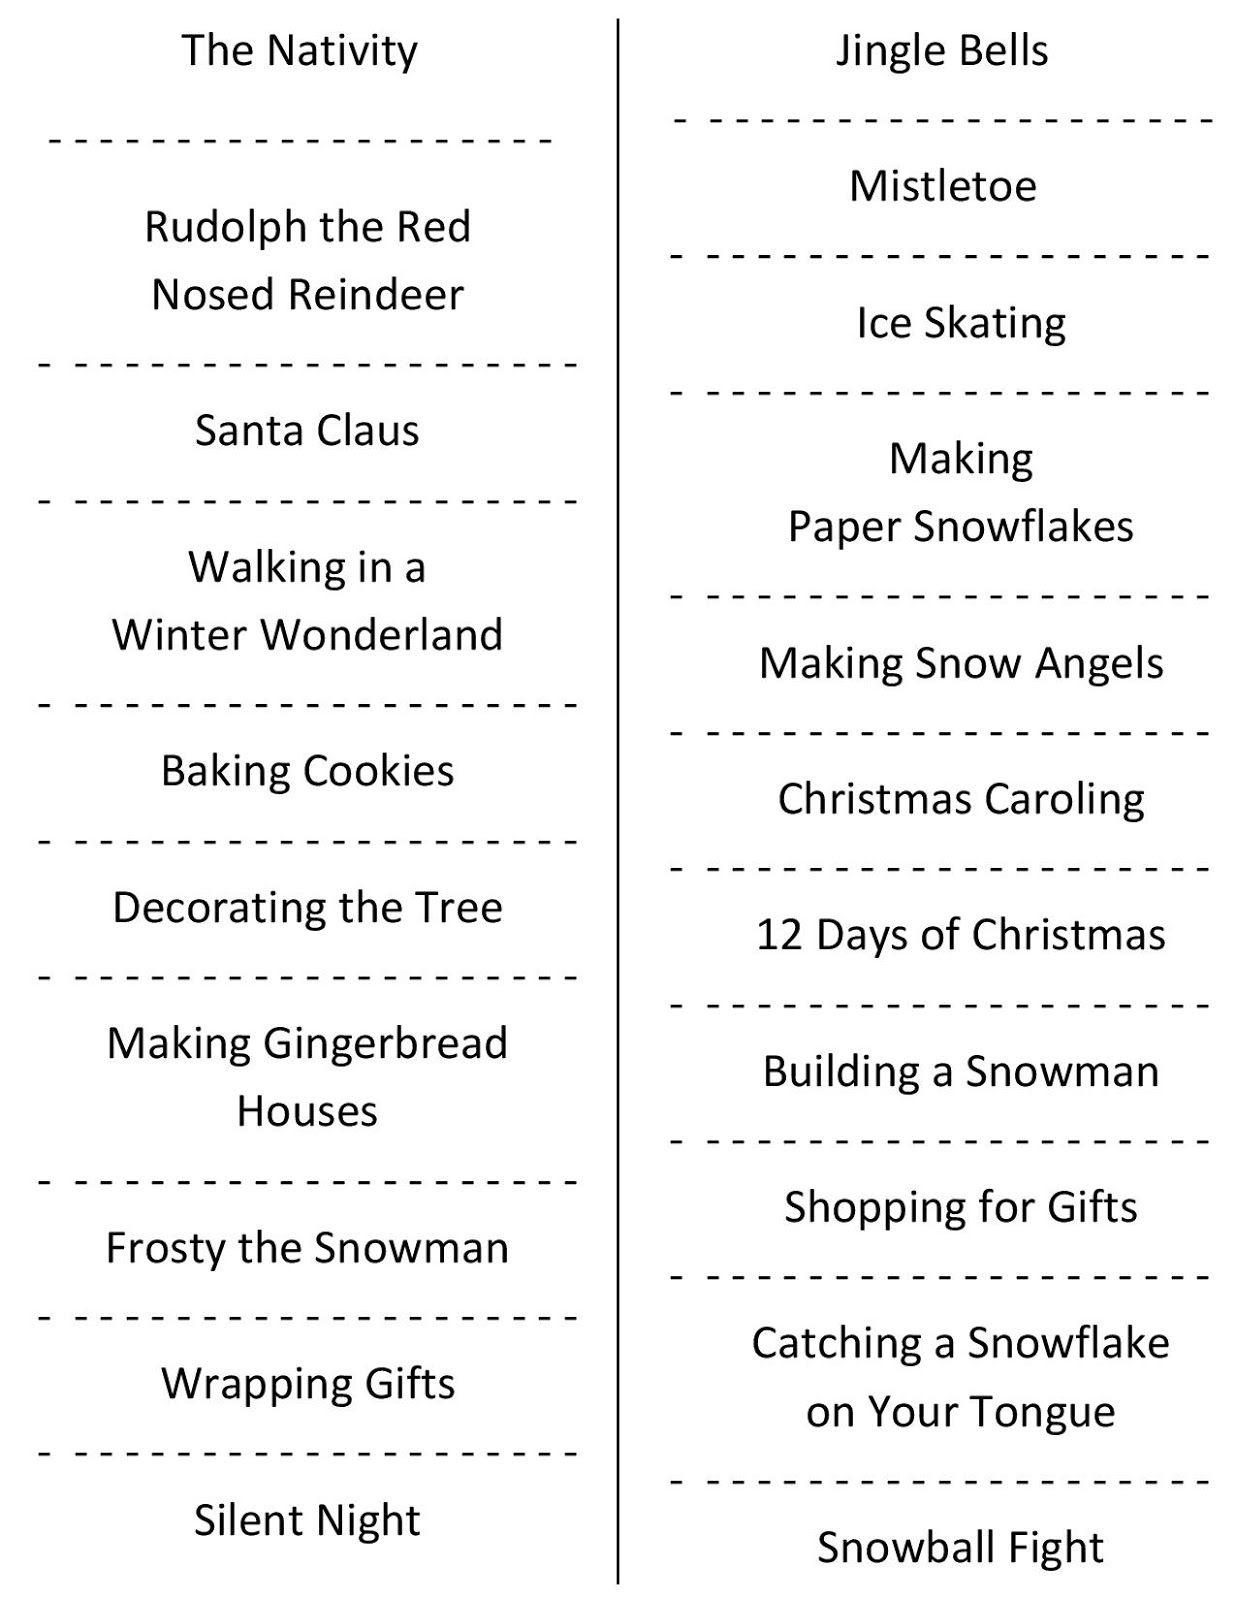 Christmas Charades (Free Printable Party Game)   Christmas   Holiday - Holiday Office Party Games Free Printable